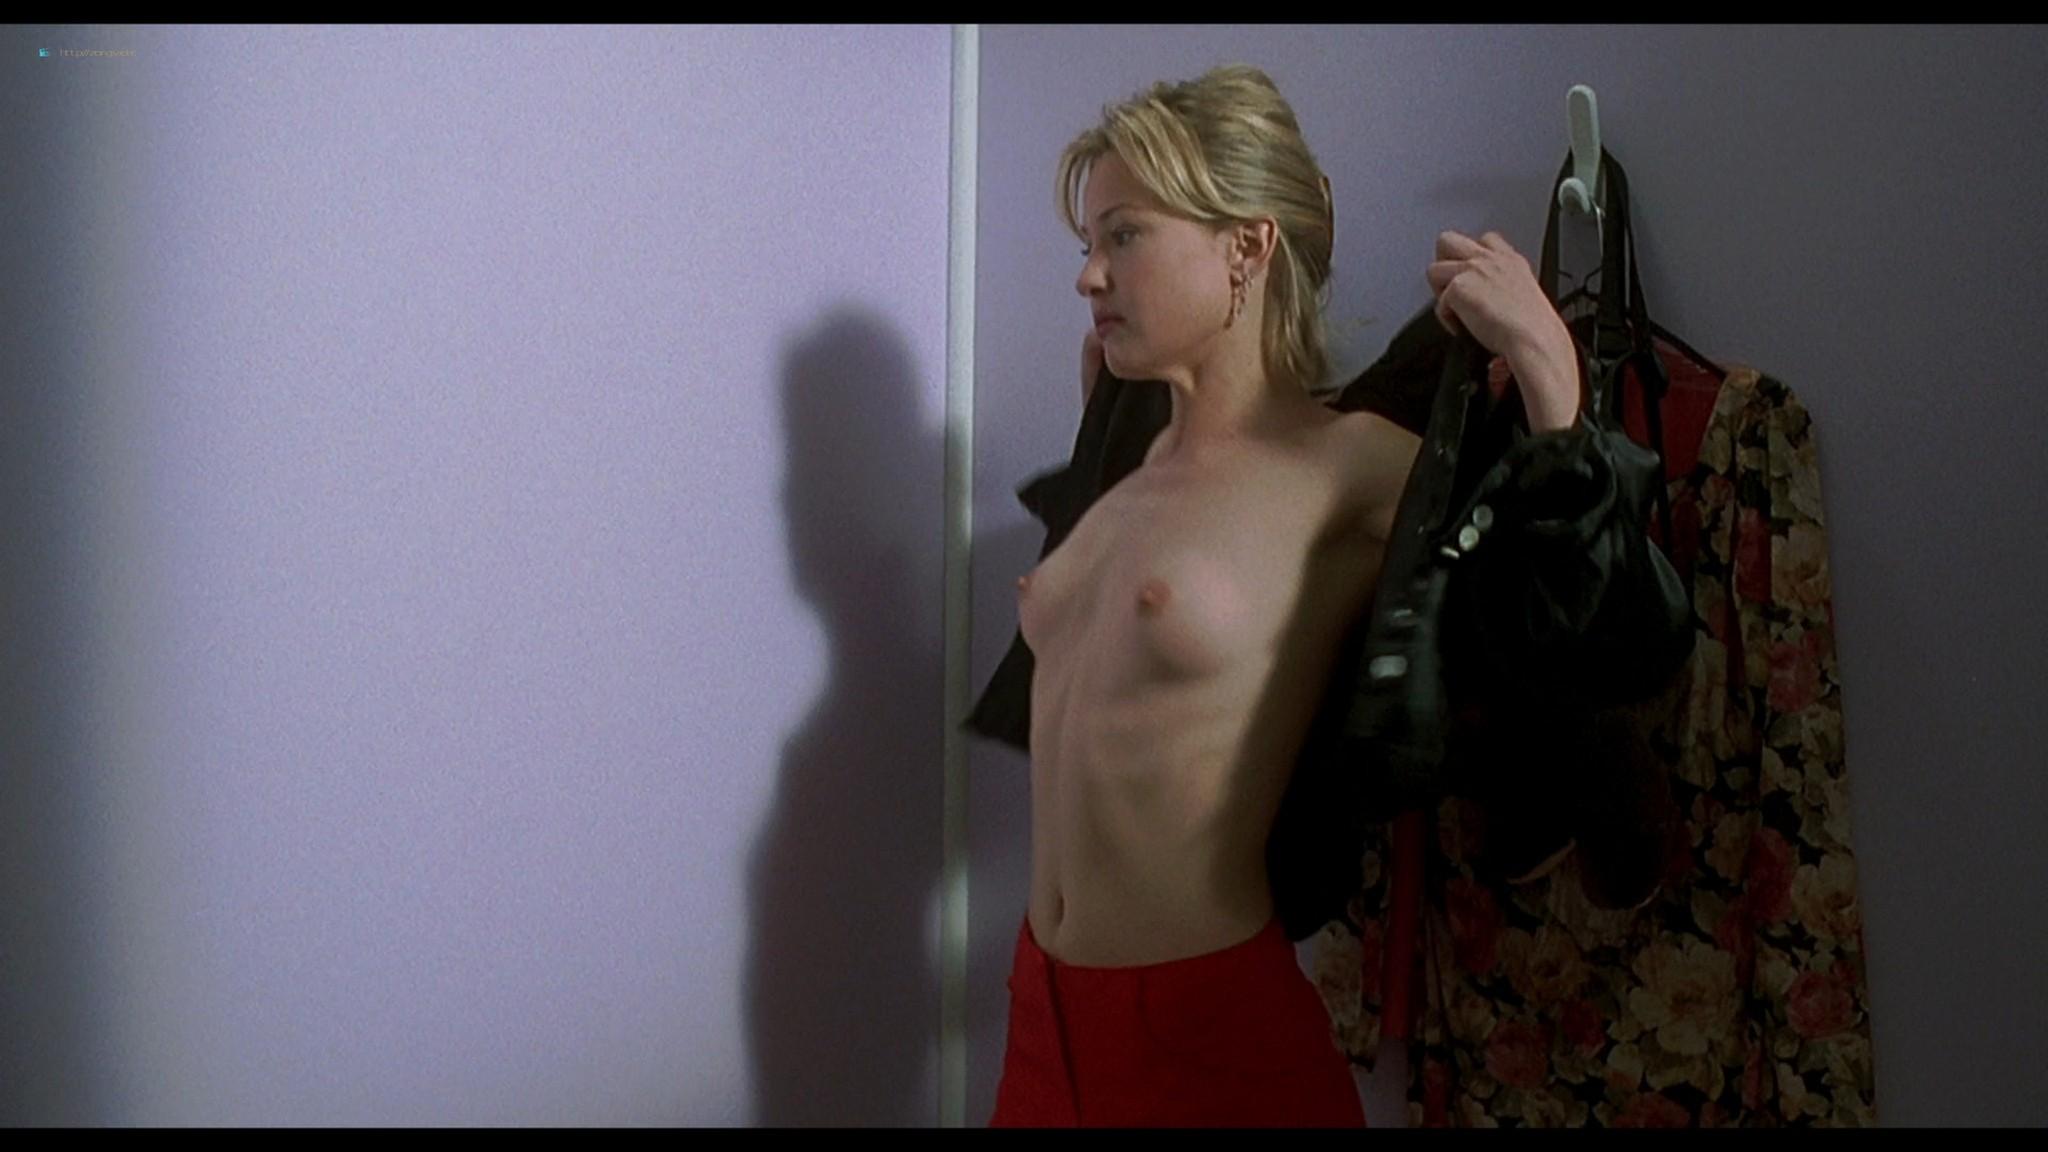 Joey Lauren Adams nude Priscilla Barnes nude topless - Mallrats (1995) HD 1080p BluRay (14)